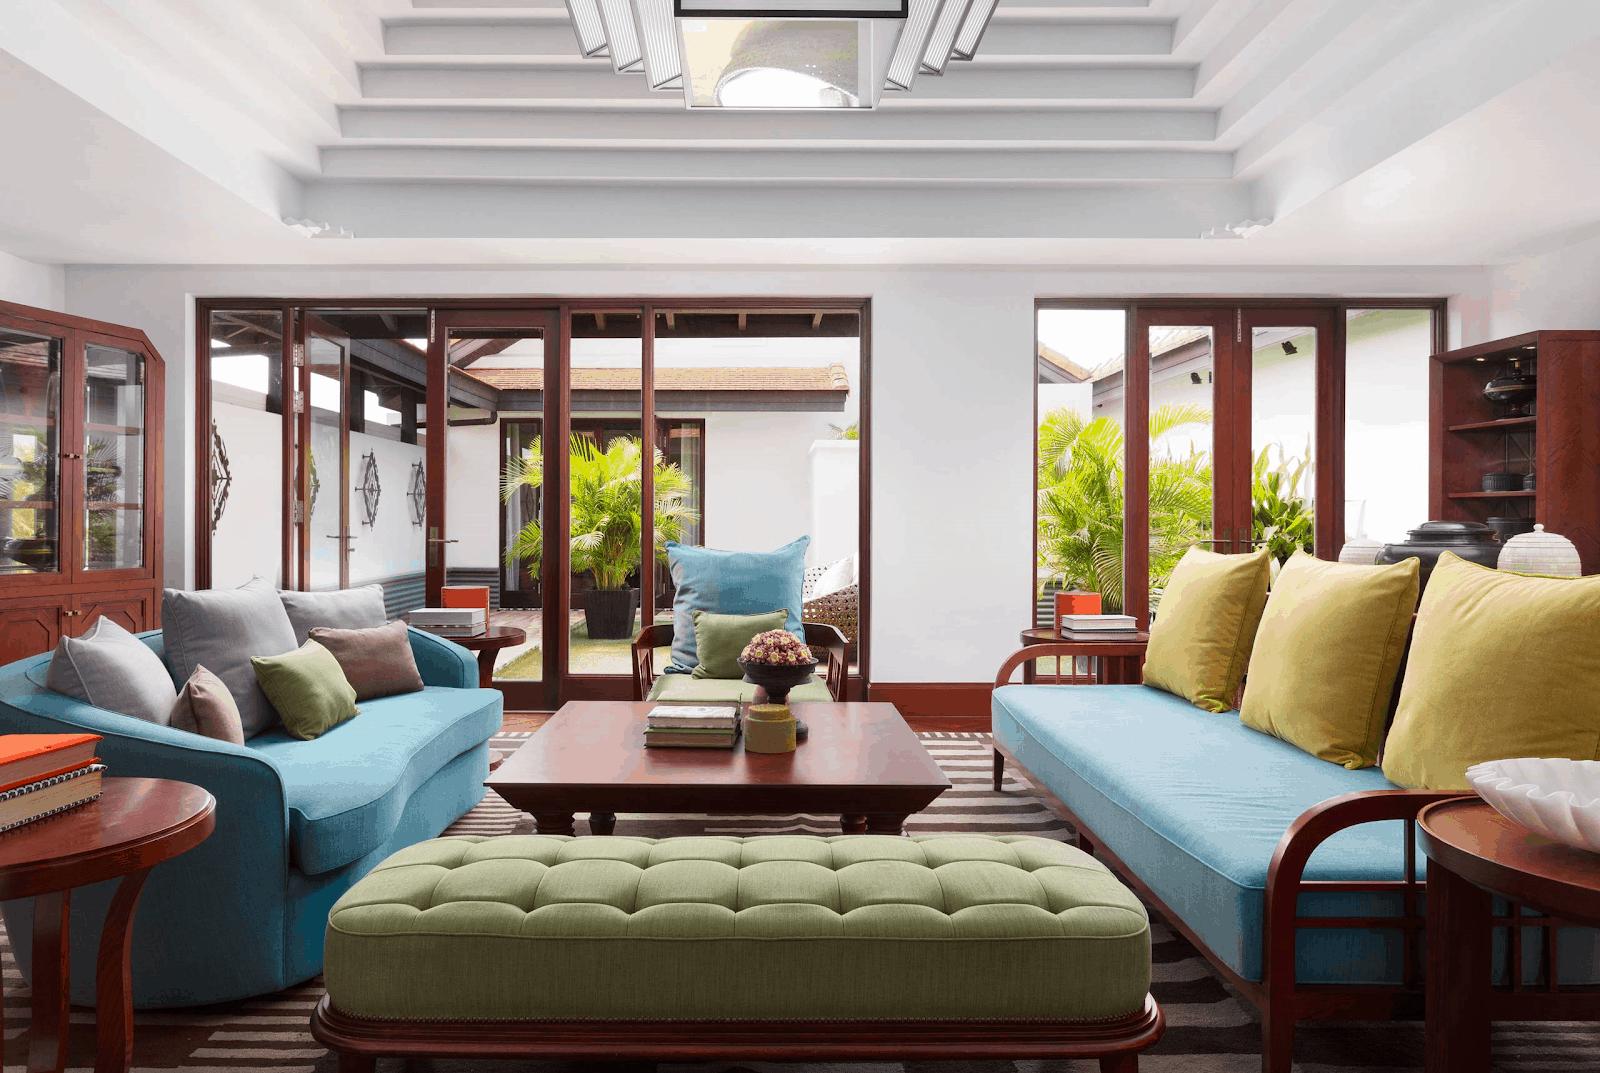 best hyatt hotels in the world for free nights-Cambodia-Park Hyatt Siem Reap